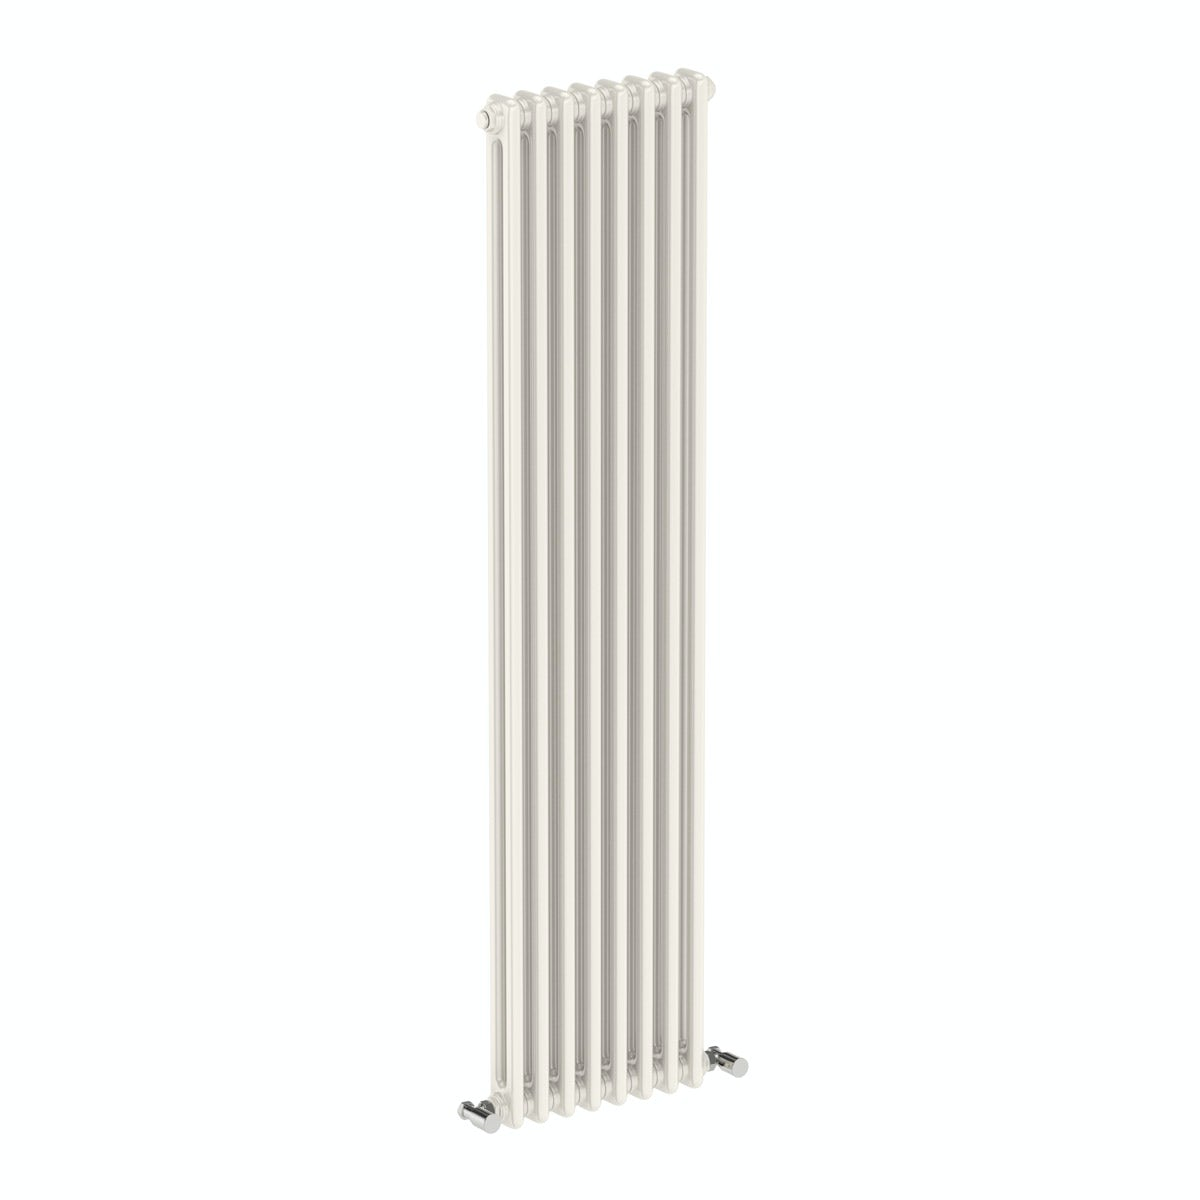 The Bath Co. Dulwich vertical white double column radiator 1500 x 380